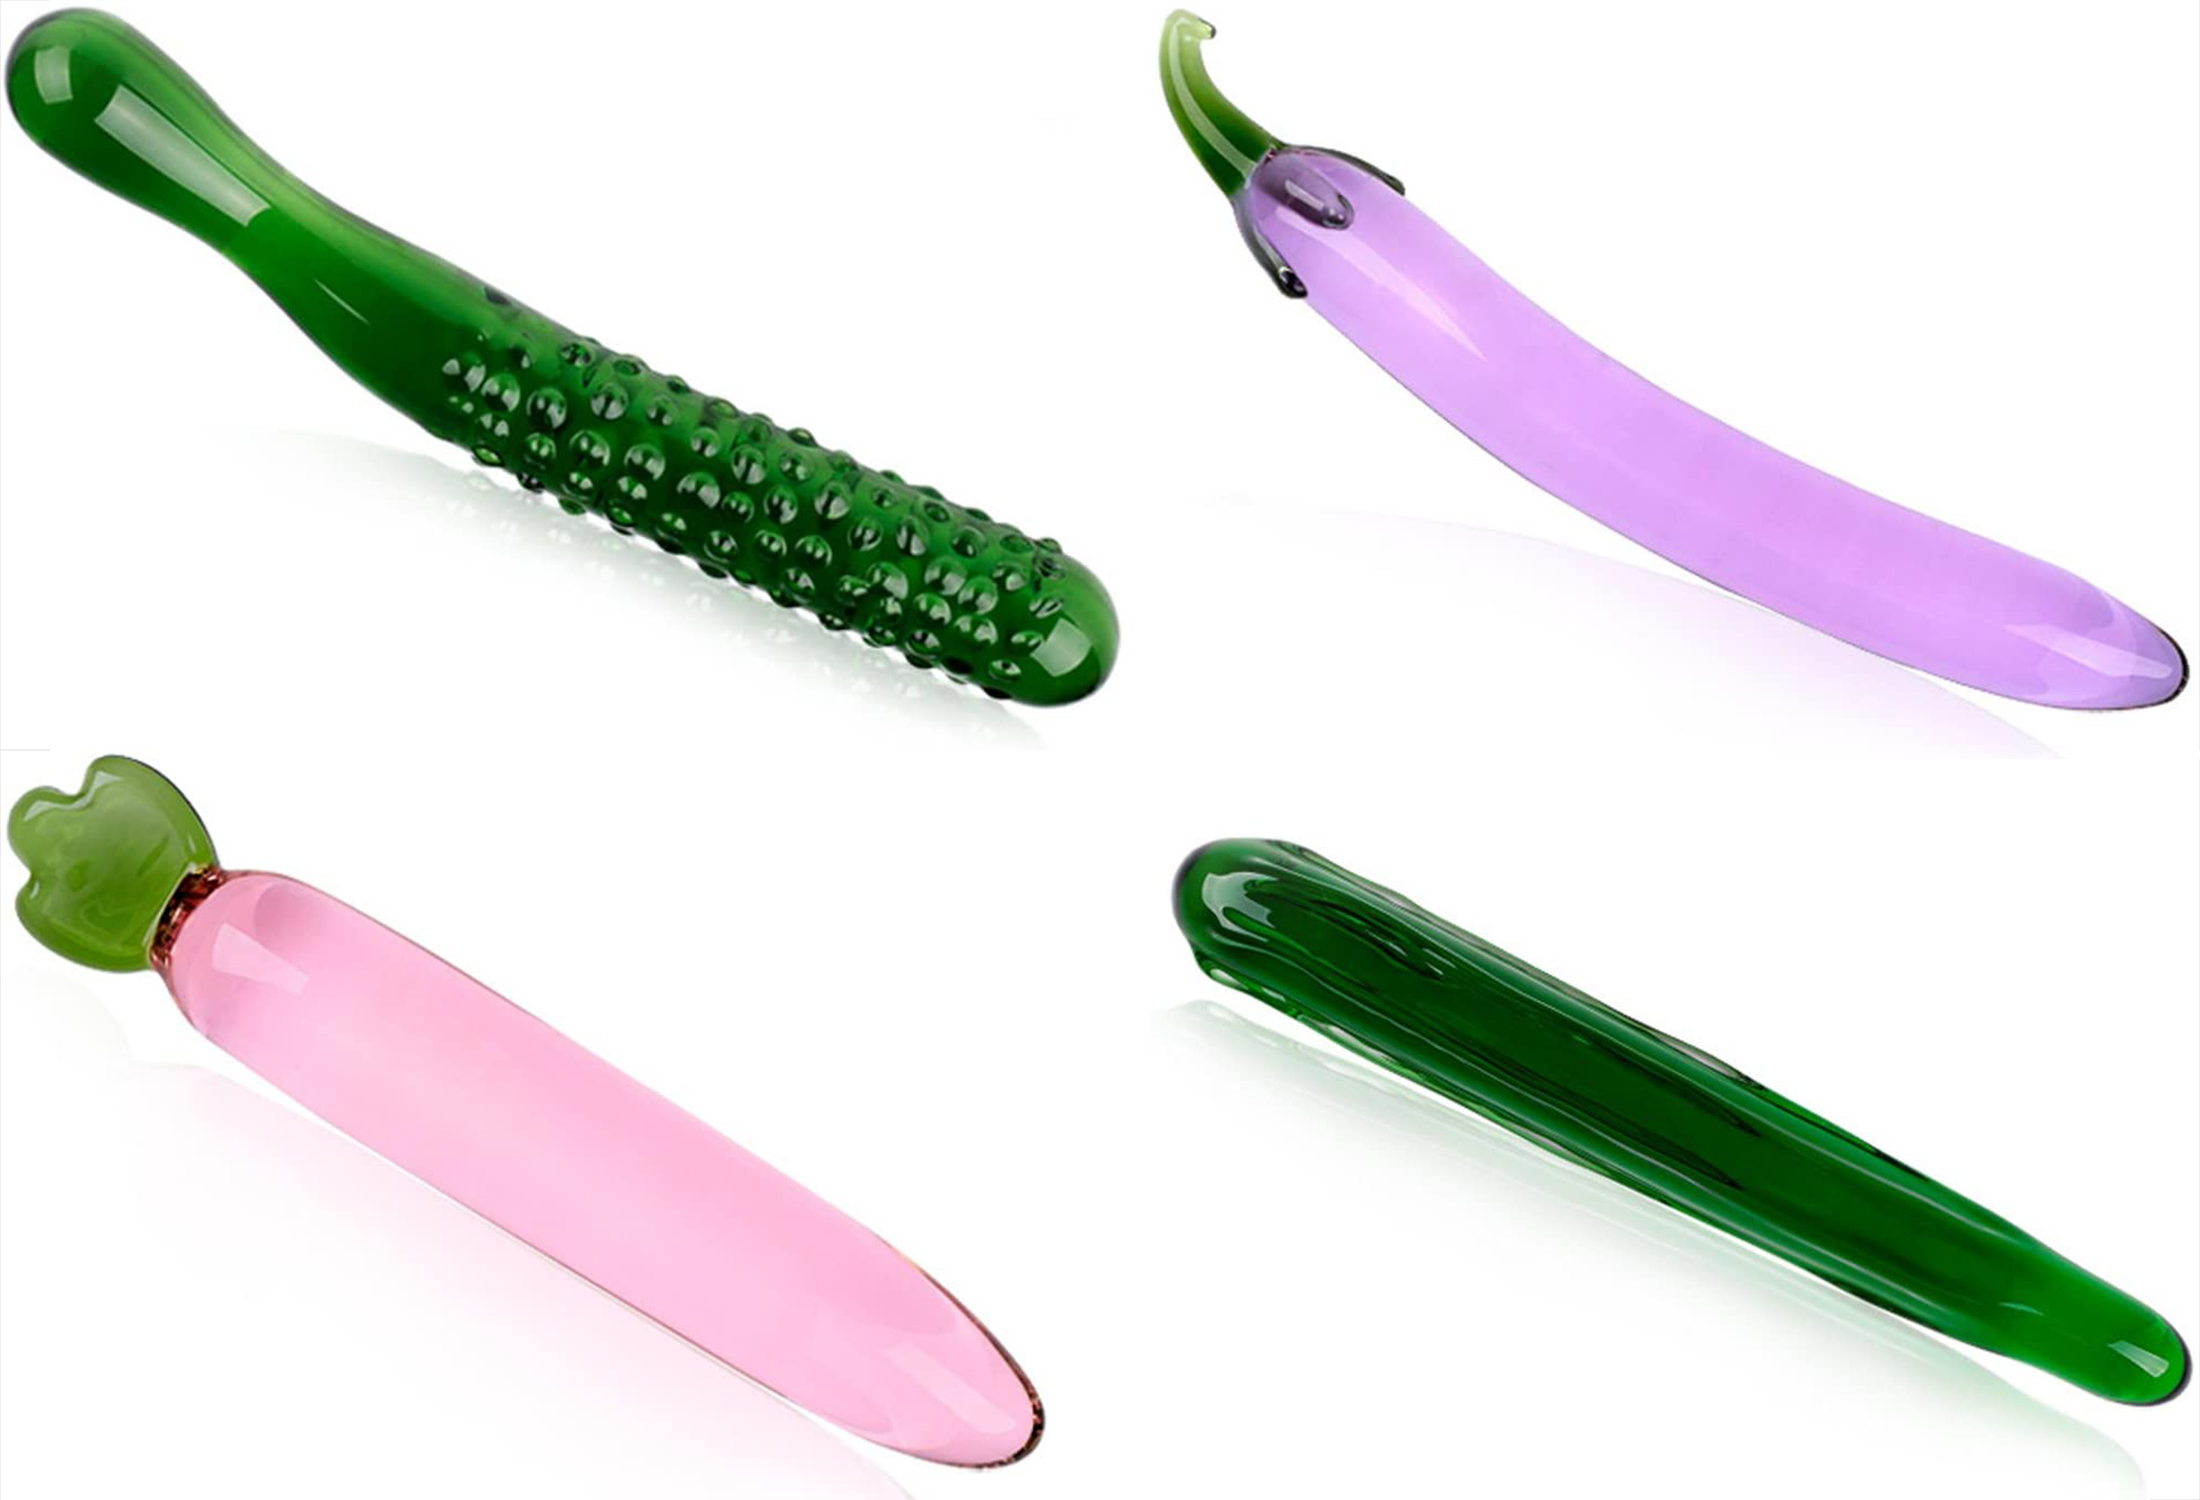 Green luffa glass dildo, purple eggplant glass dildo, pink carrot glass dildo and green cucumber glass dildo